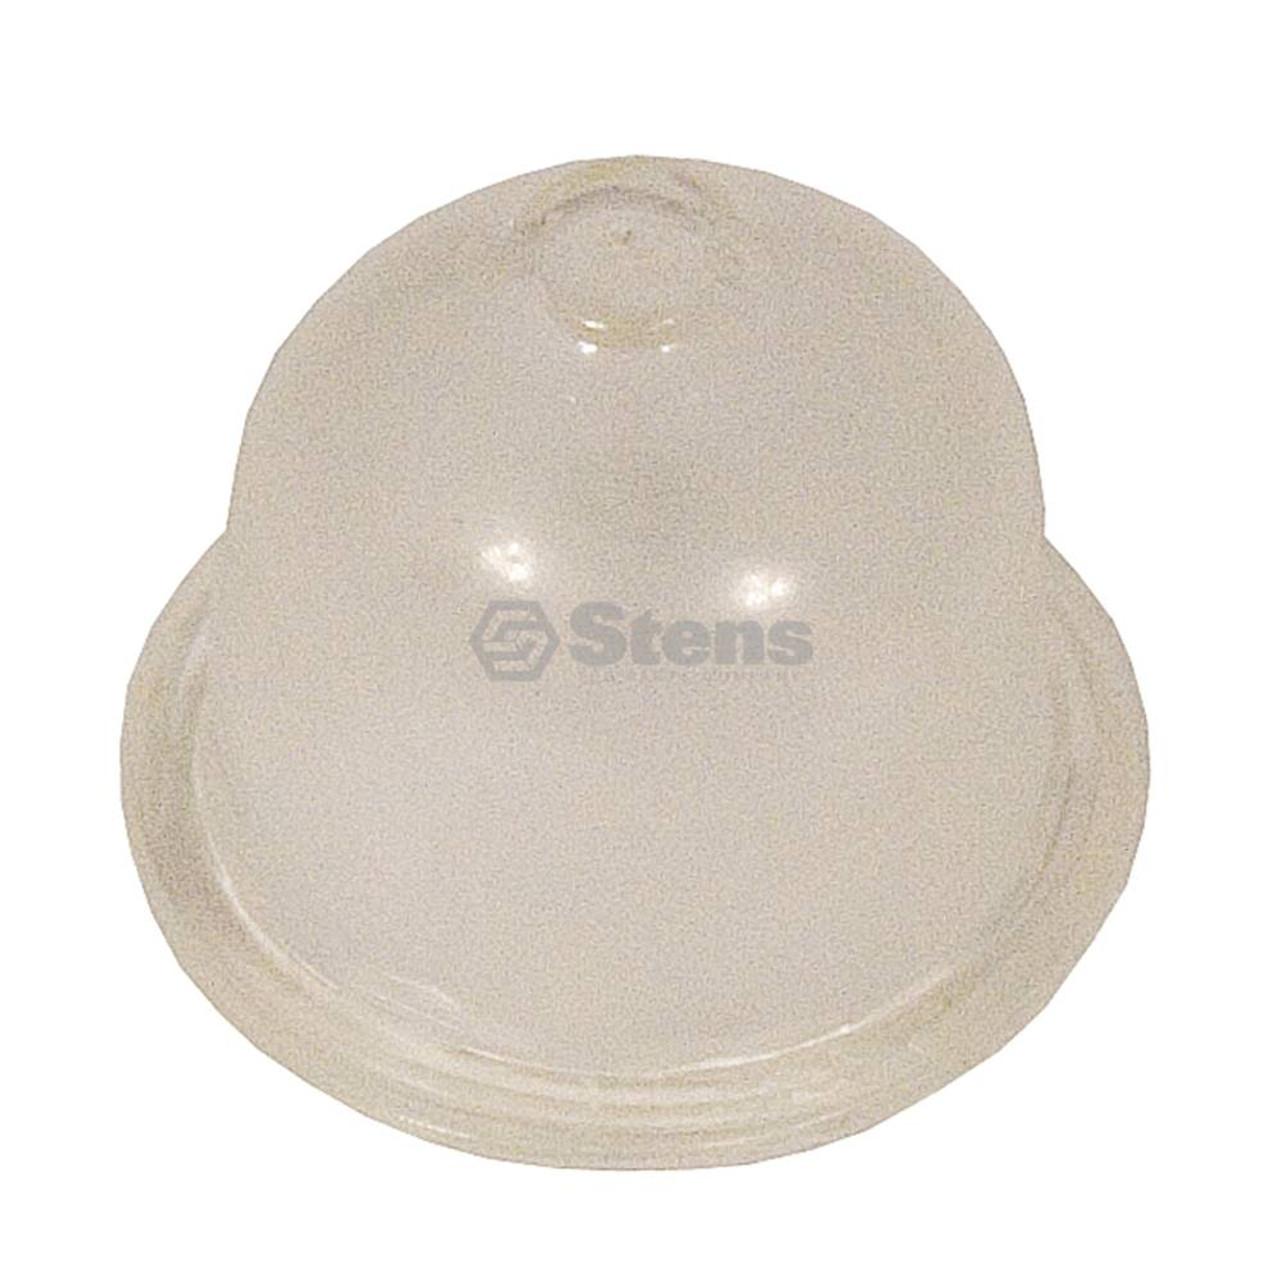 Primer Bulb / Walbro 188-12-1